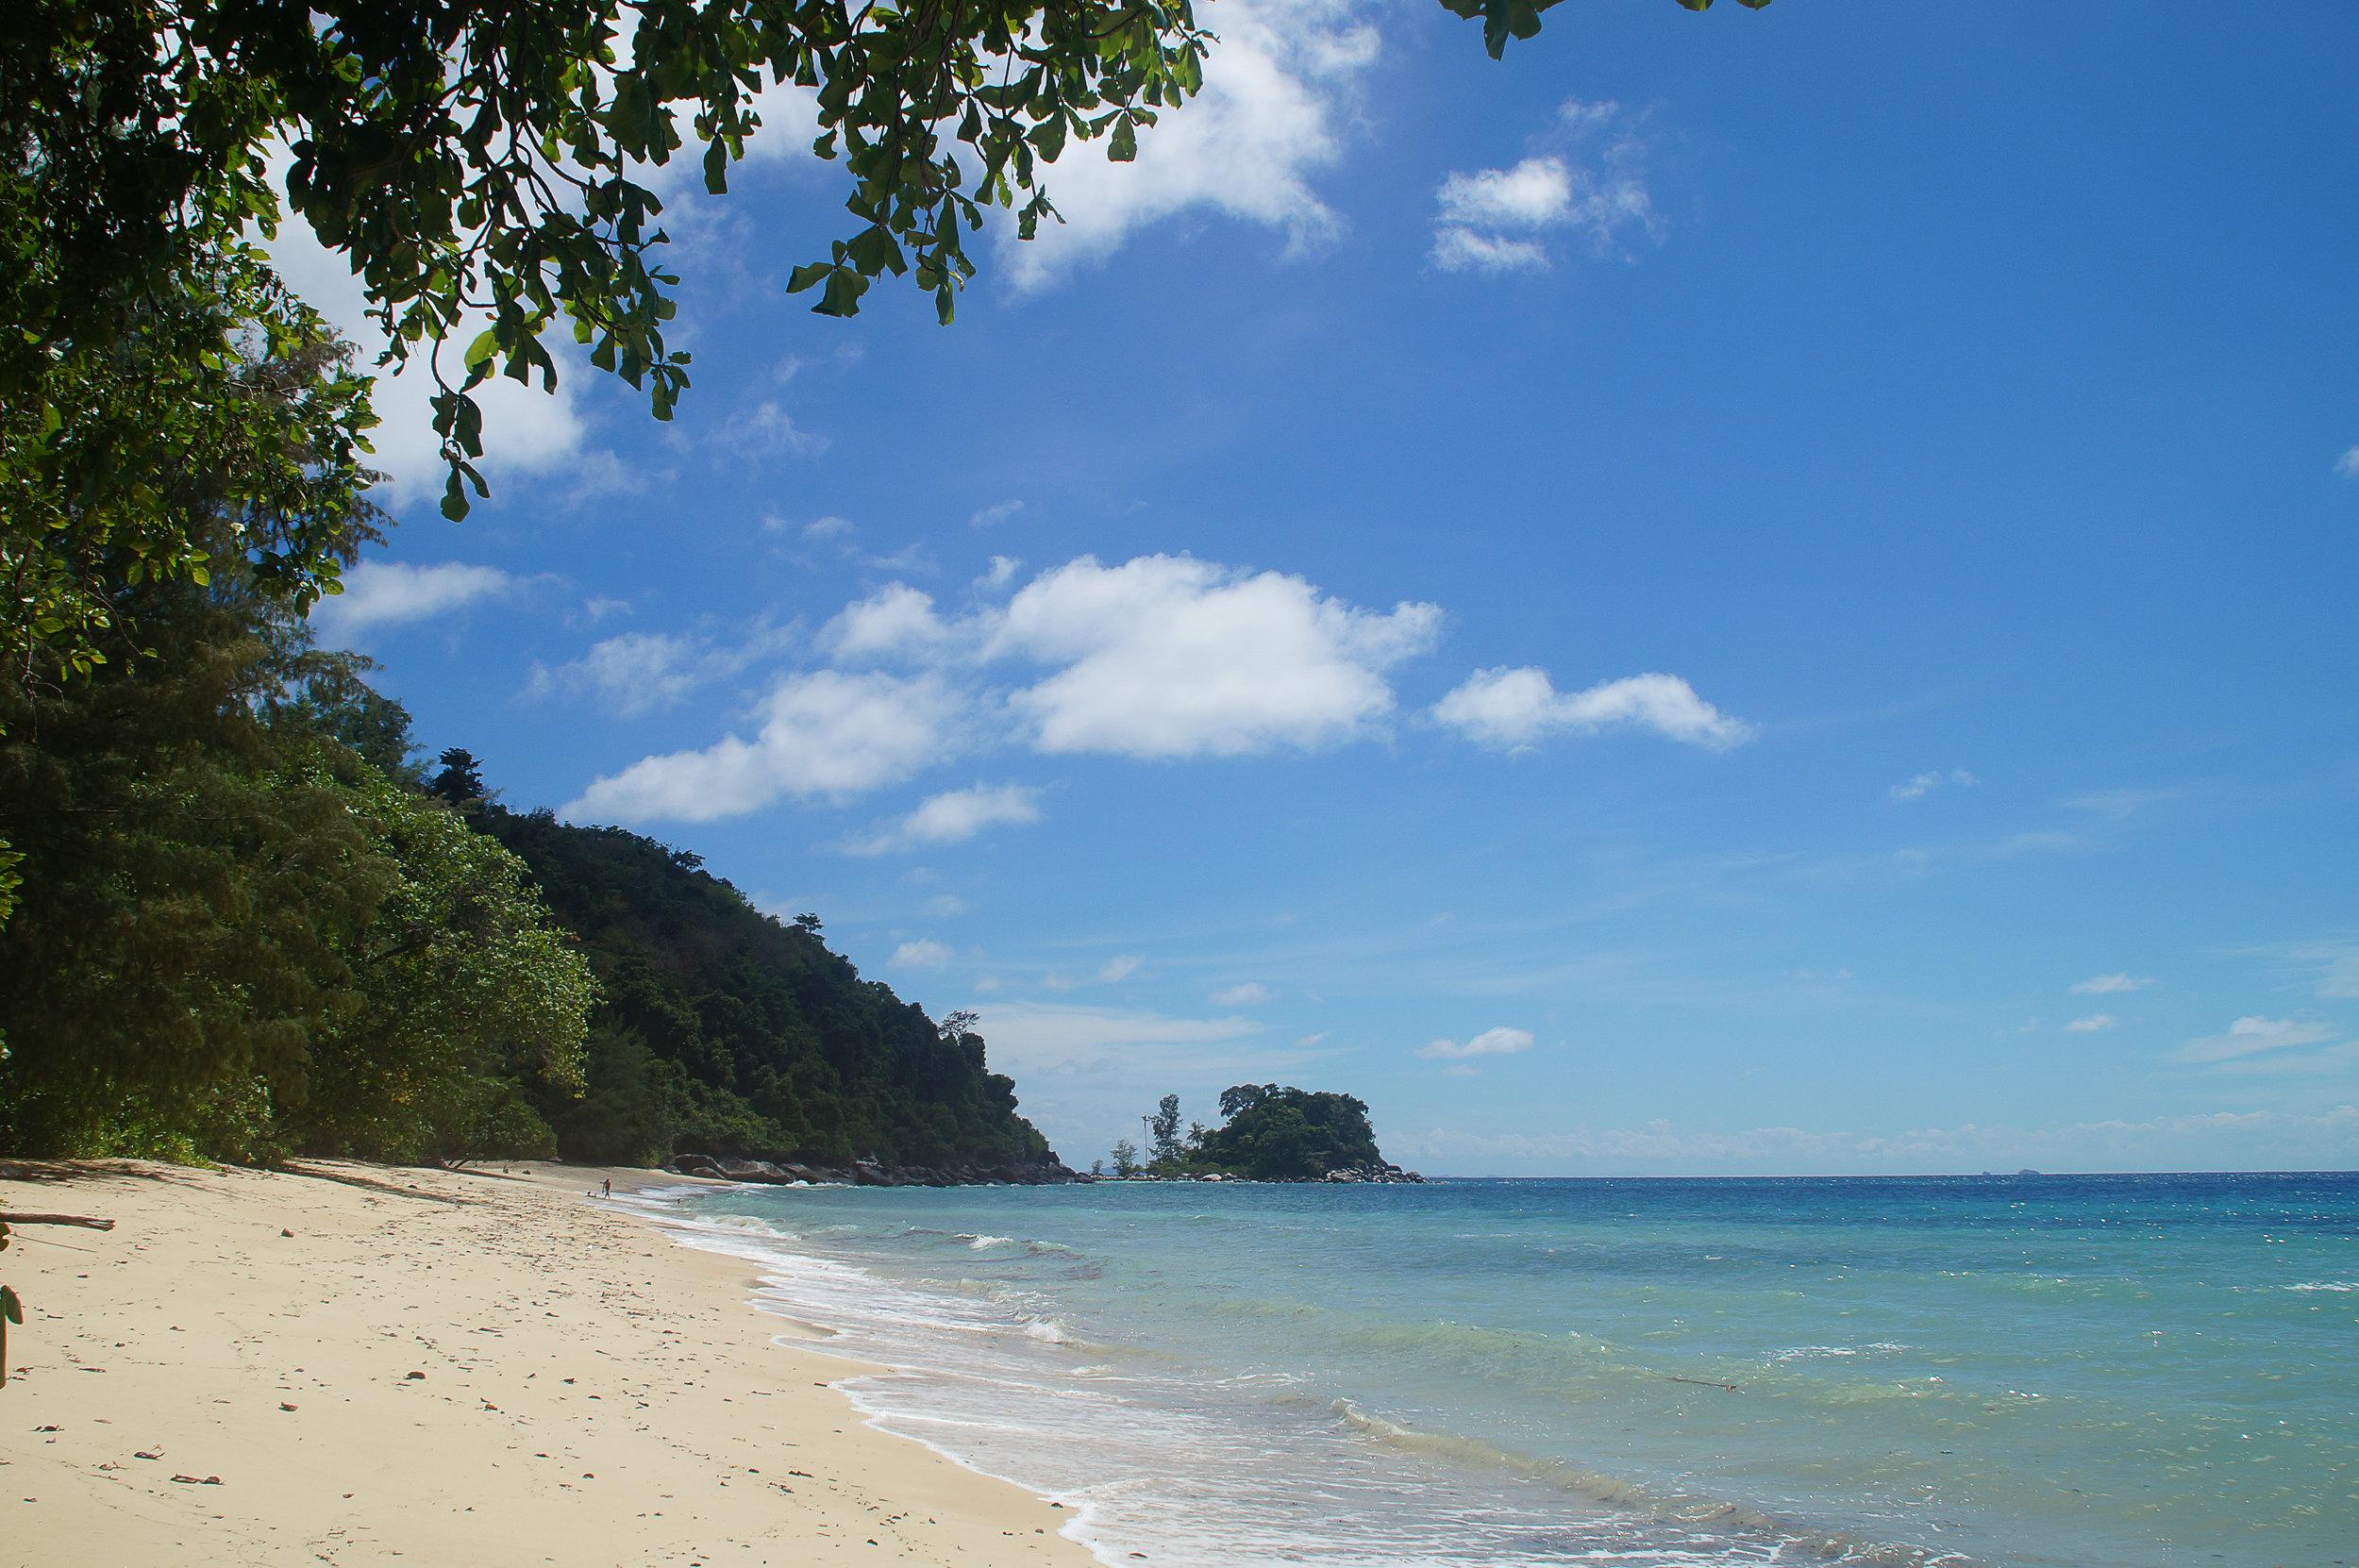 Tioman Island, Malaysia. The  Juara Turtle Project  protects Green and Hawksbill turtles.